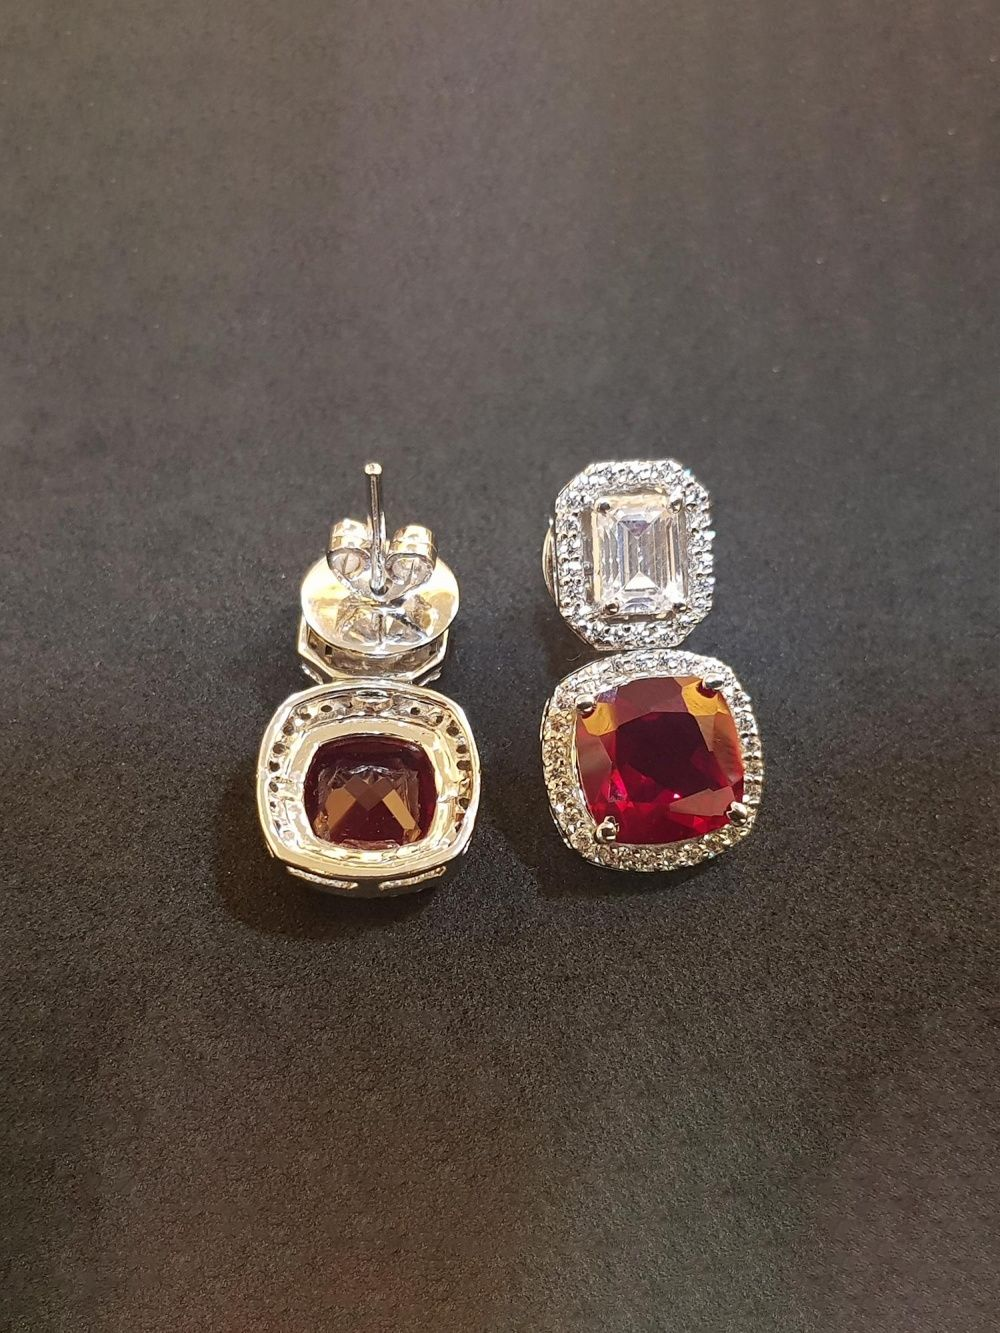 dd6f2776e Bejeweled Earrings : Buy Rhodium Finish Emerald Cut With Red Cushion ...